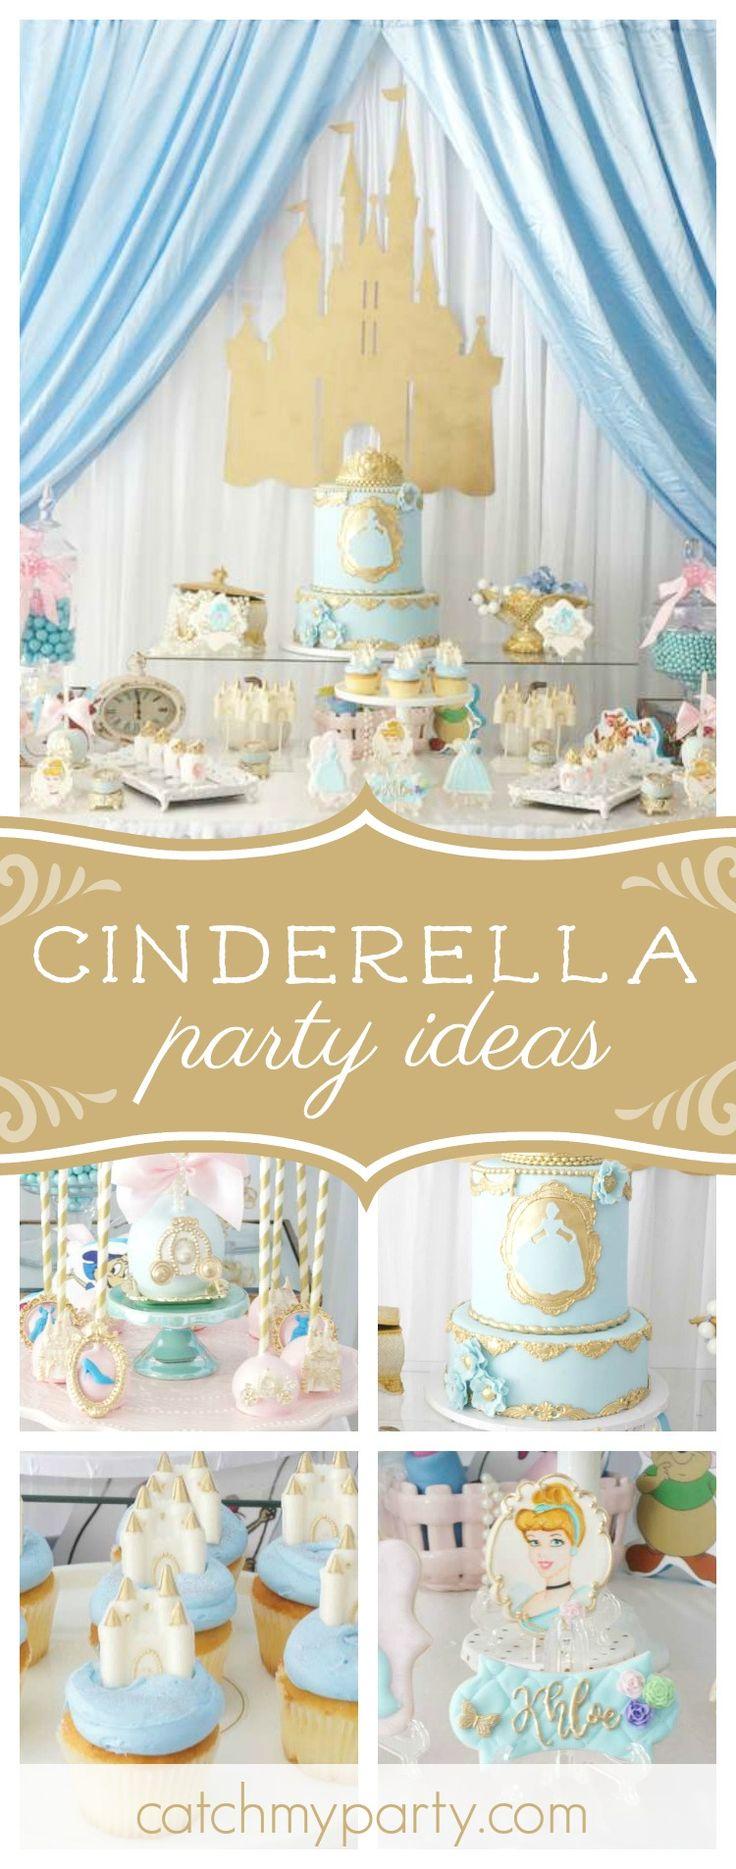 259 best Cinderella Party Ideas images on Pinterest | Cinderella ...